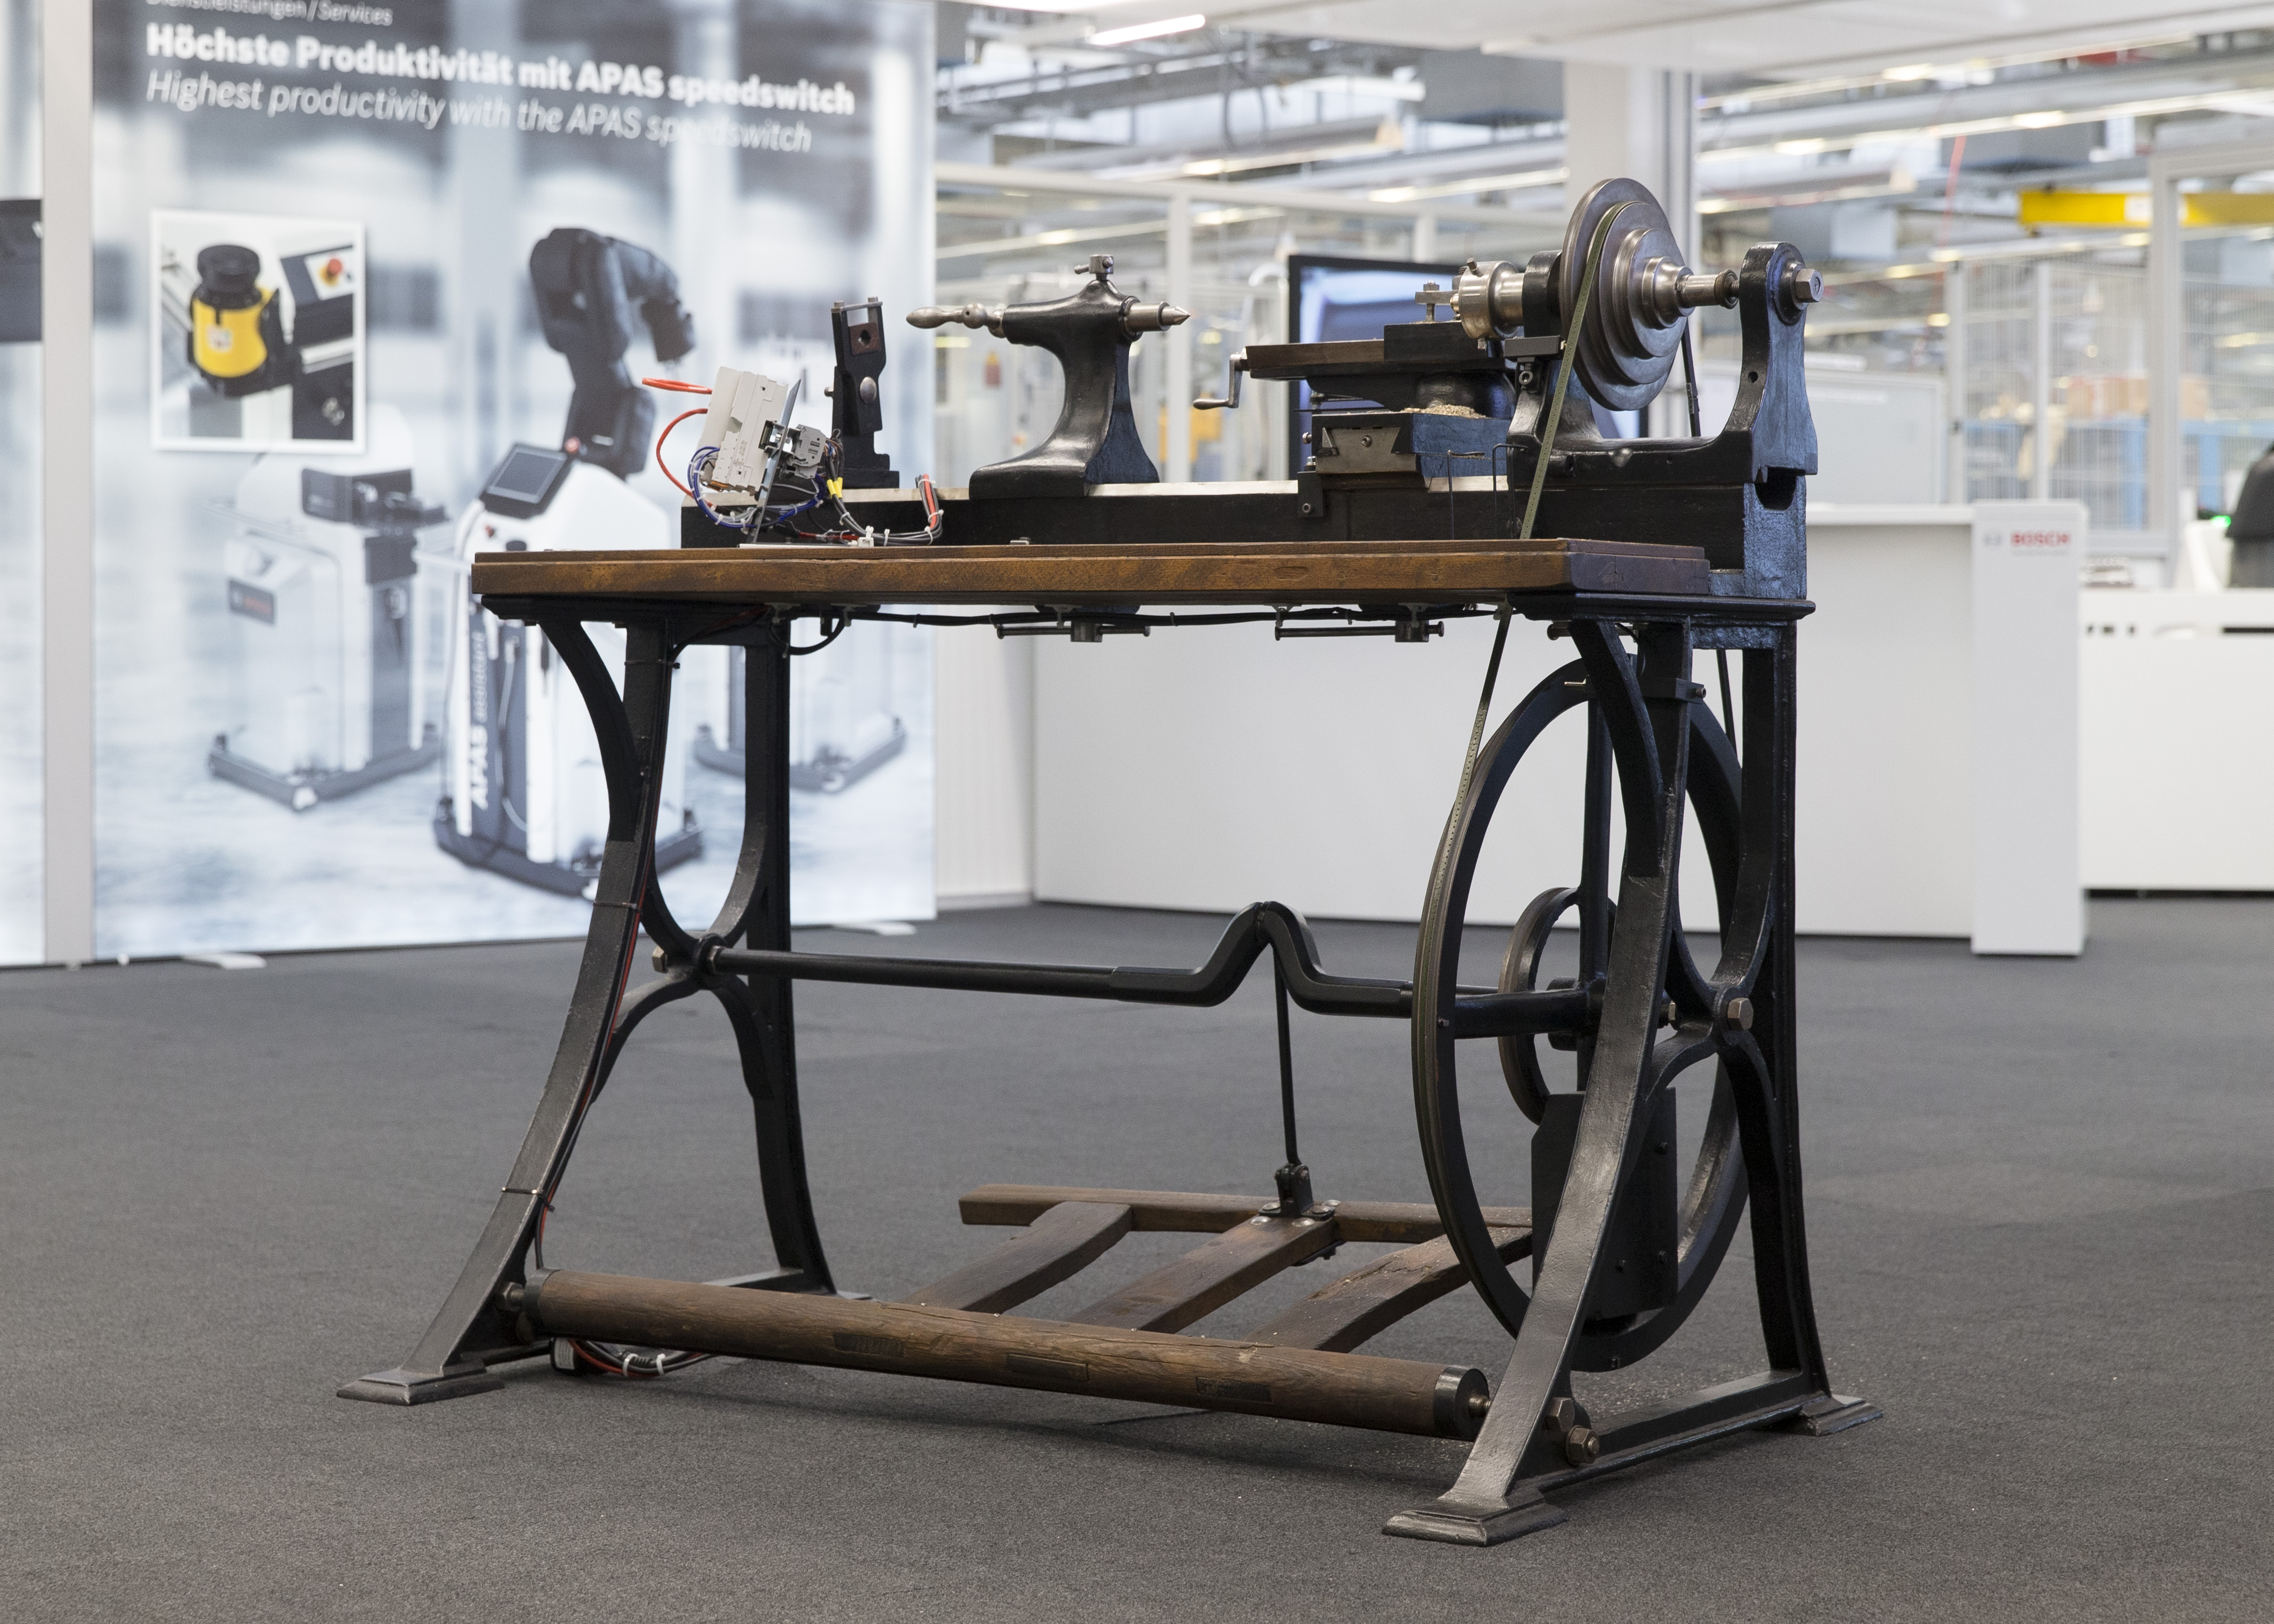 Old lathe from Robert Bosch